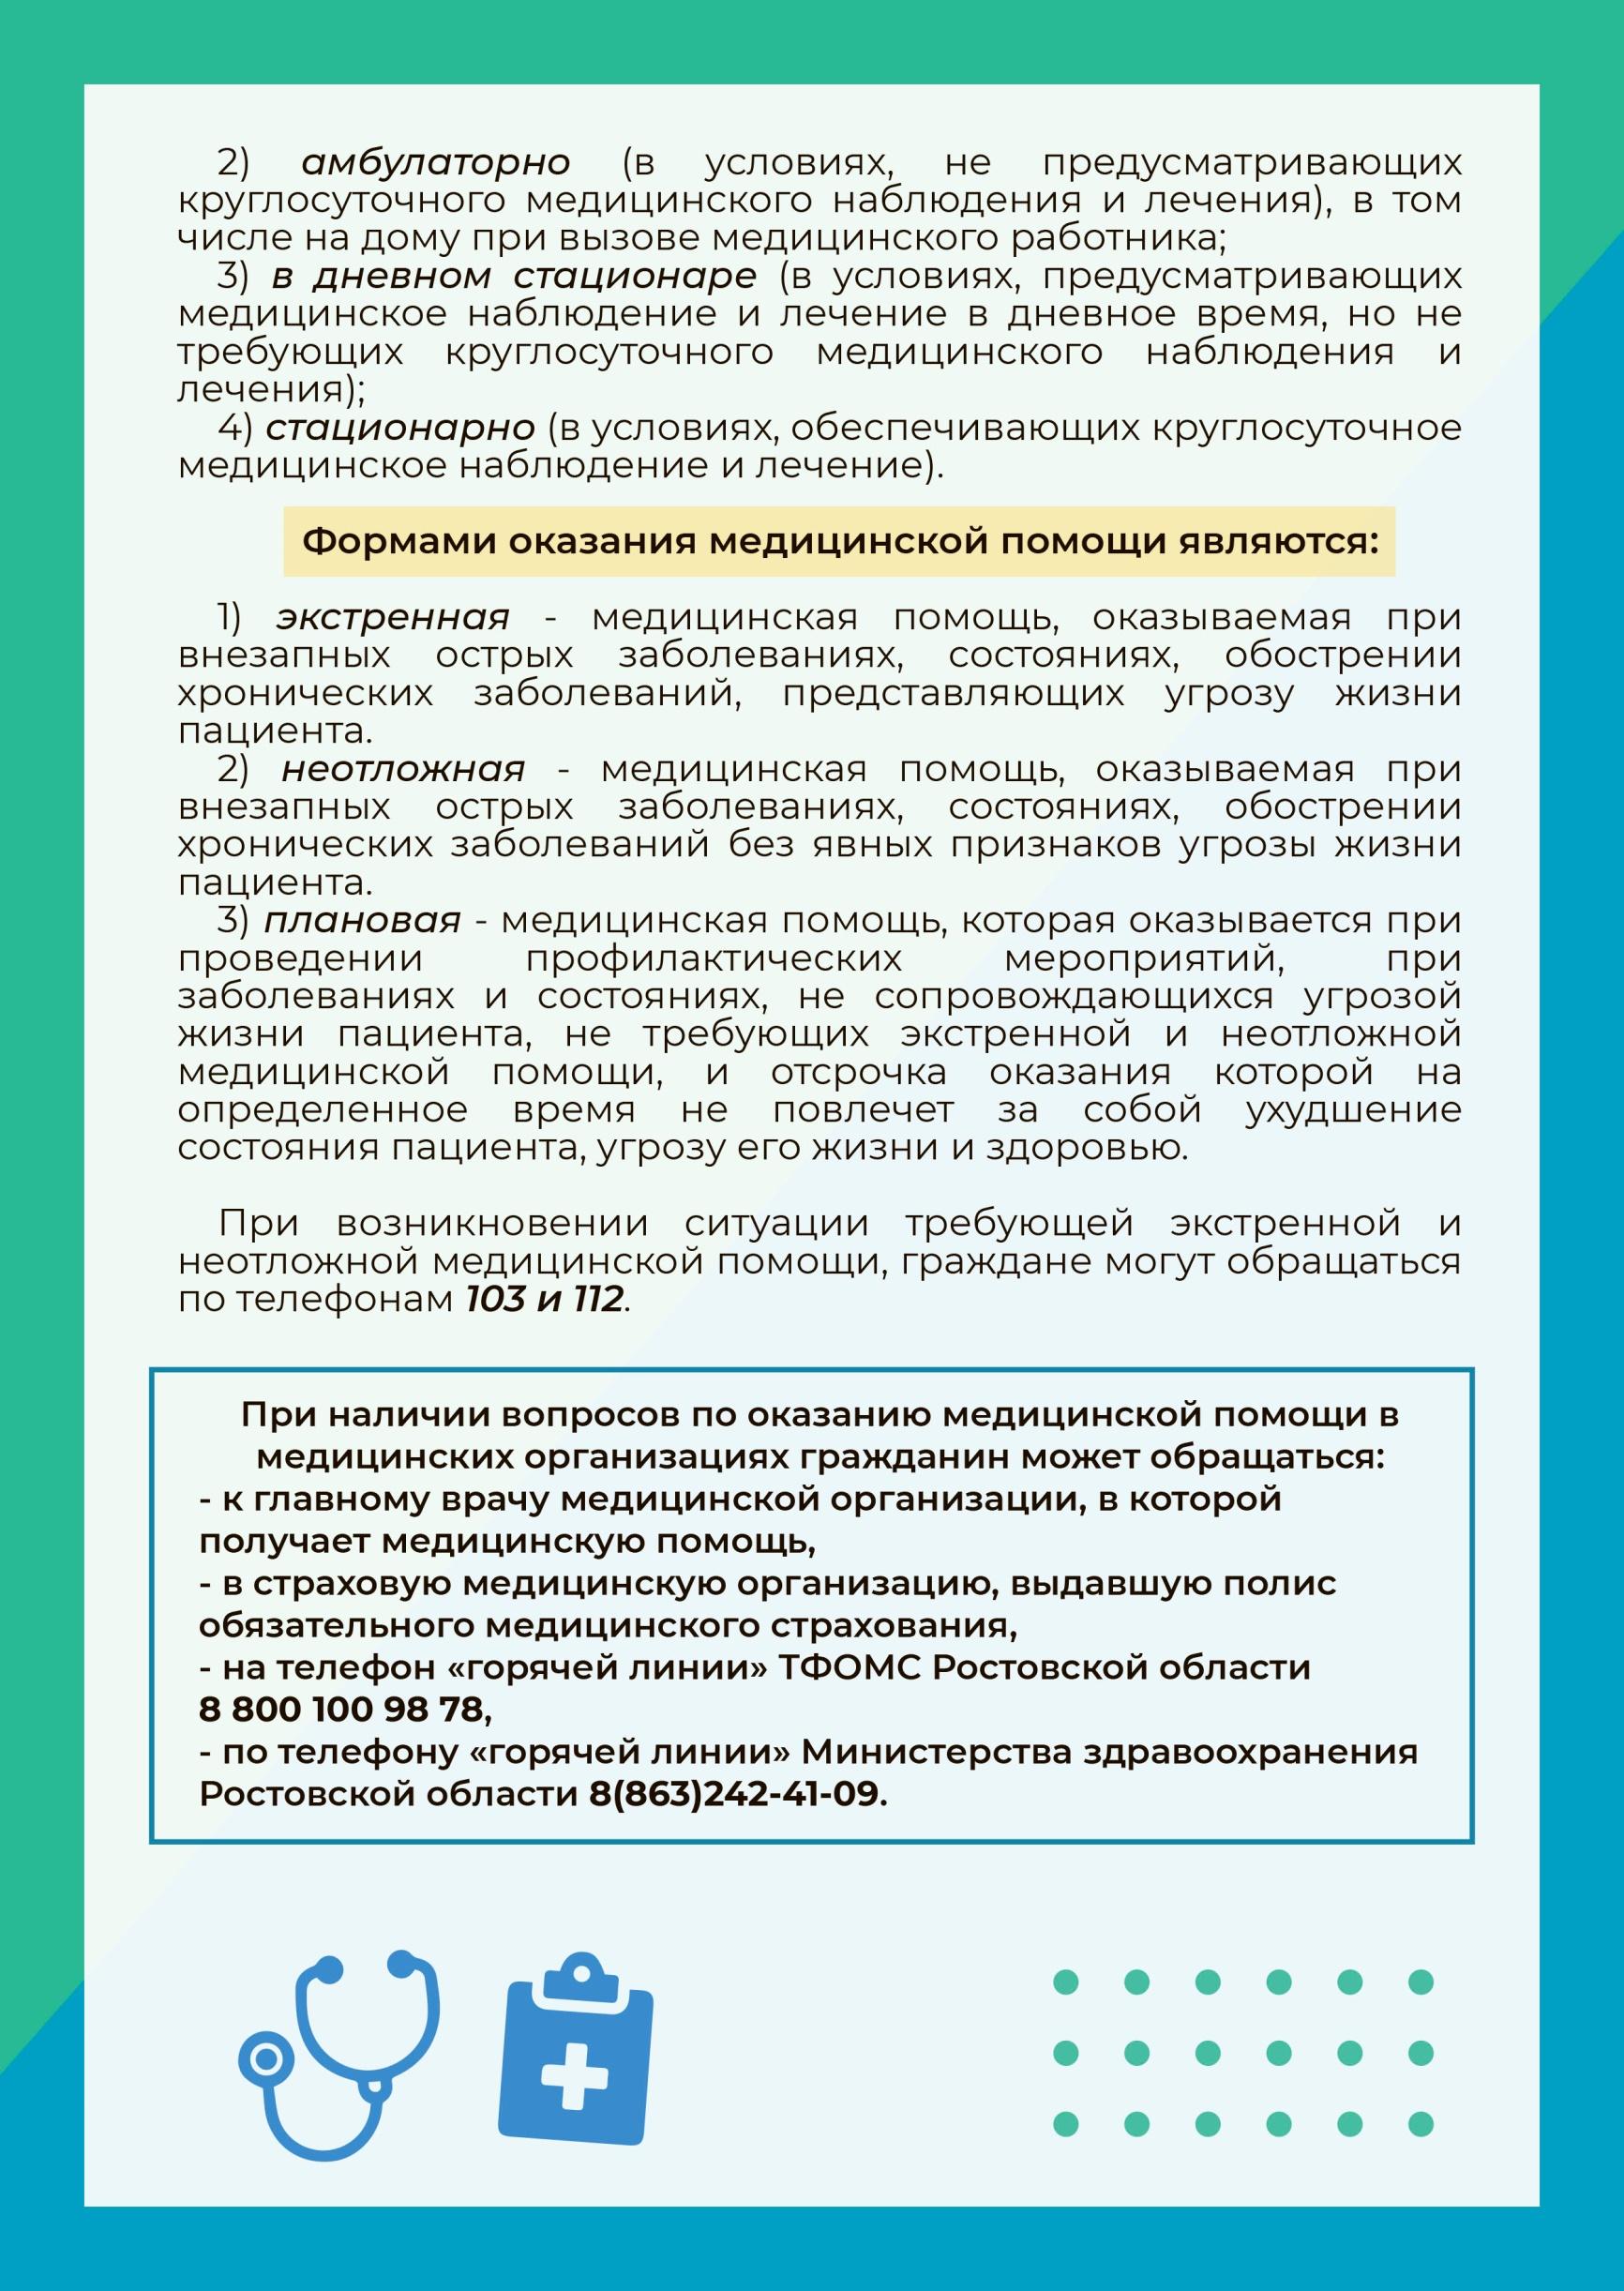 C:\Users\user5\YandexDisk\Сайт\Картинки\Памятка для размещения на сайте-2.jpg